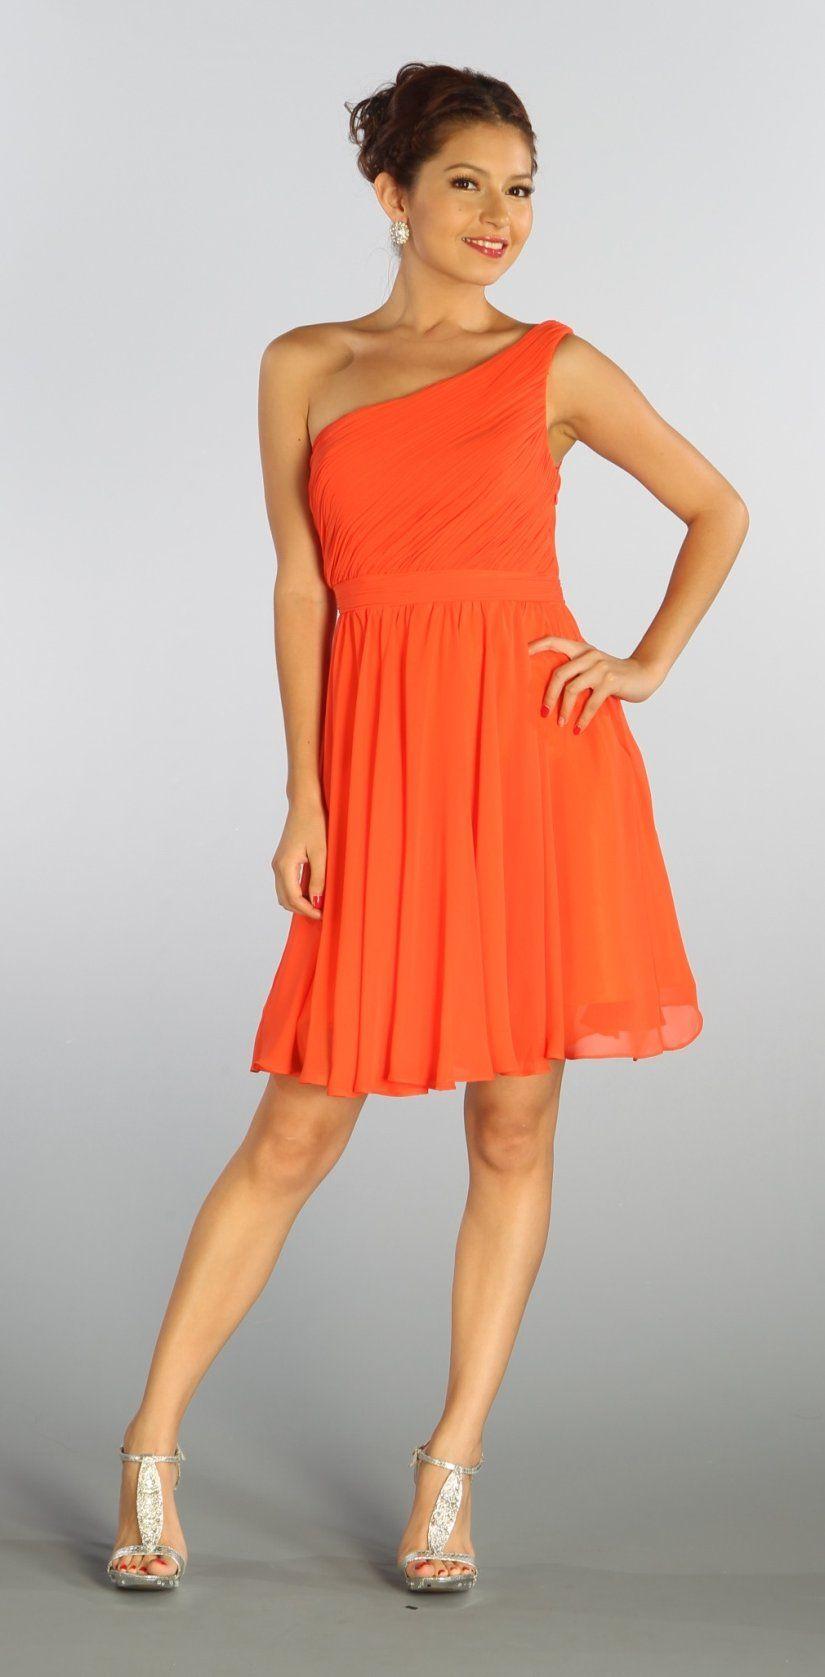 Camo and orange wedding dresses  One Shoulder Chiffon Short OrangeCoral Bridesmaid Dress Ruched